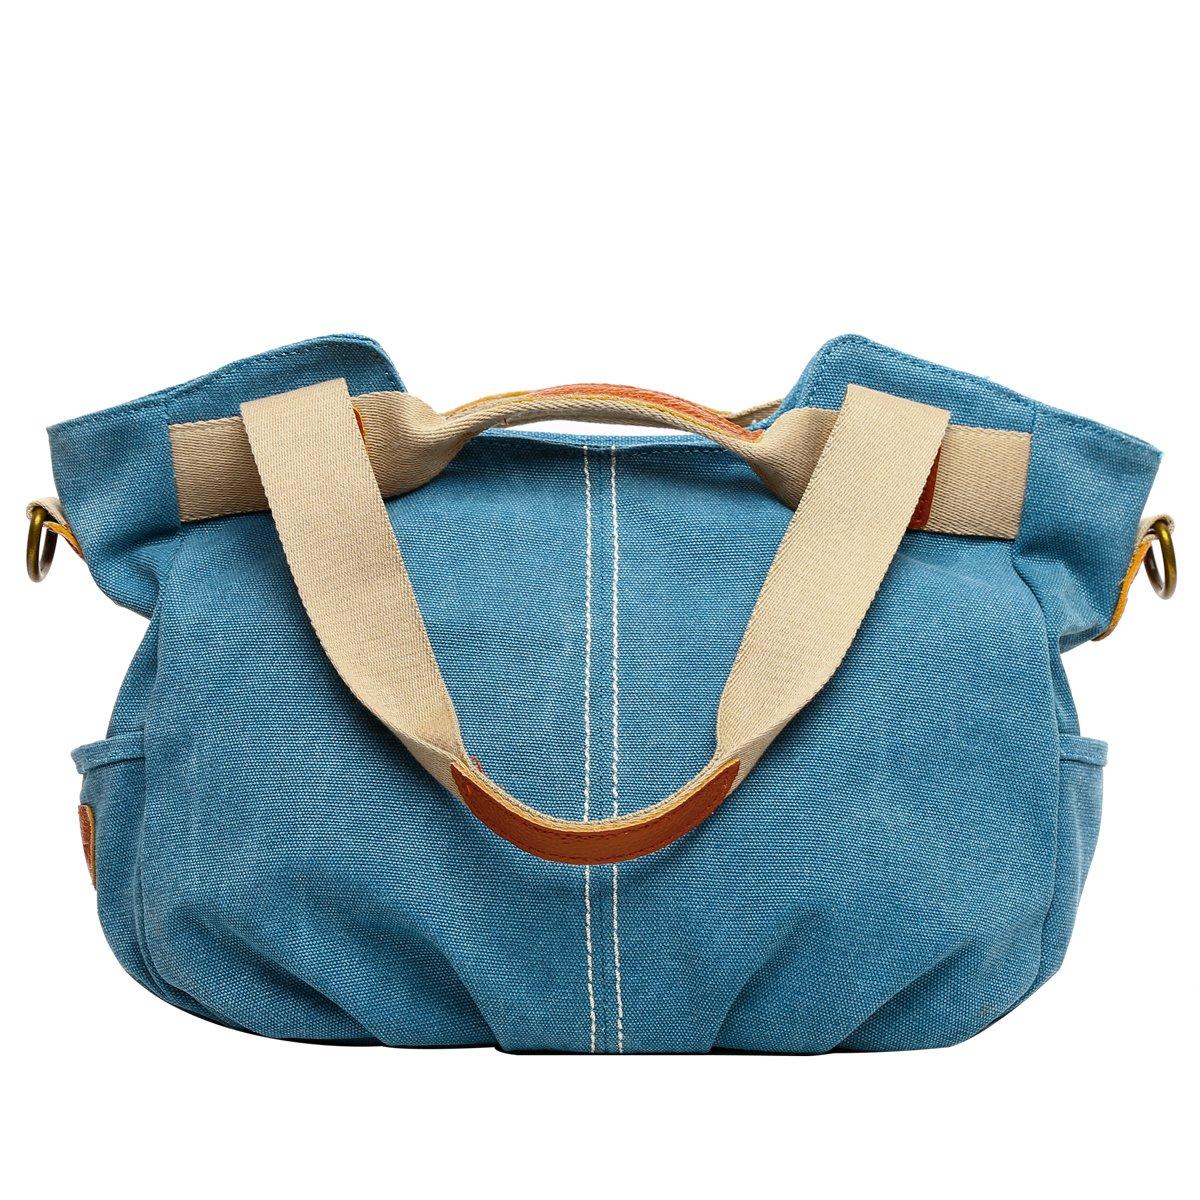 Eshow Women's Canvas bag Top Handle Totes Shoulder Bag Shopping Travel School Cross body Bag for Women Tote handbag Messenger Bag Daily Bag Purse,Blue Eshow-BFK010802